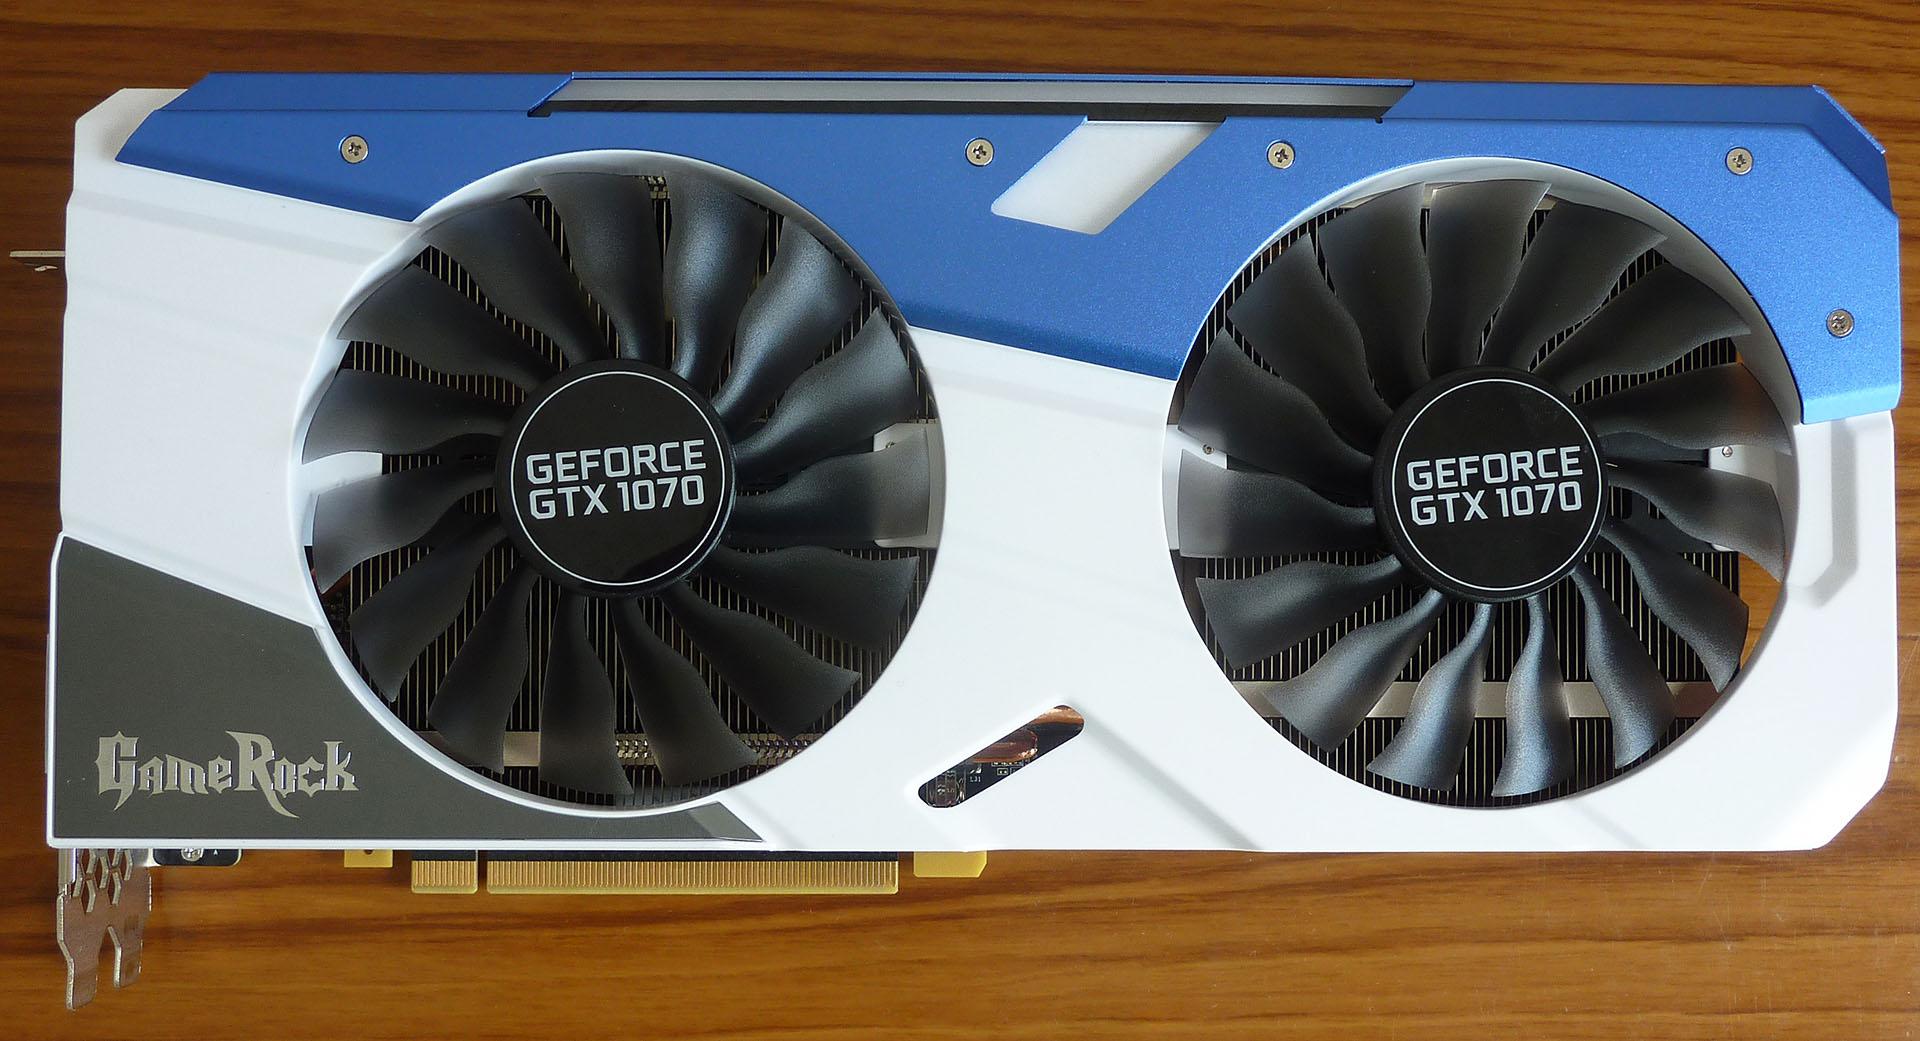 Review: Palit GeForce GTX 1070 GameRock Premium Edition - Graphics